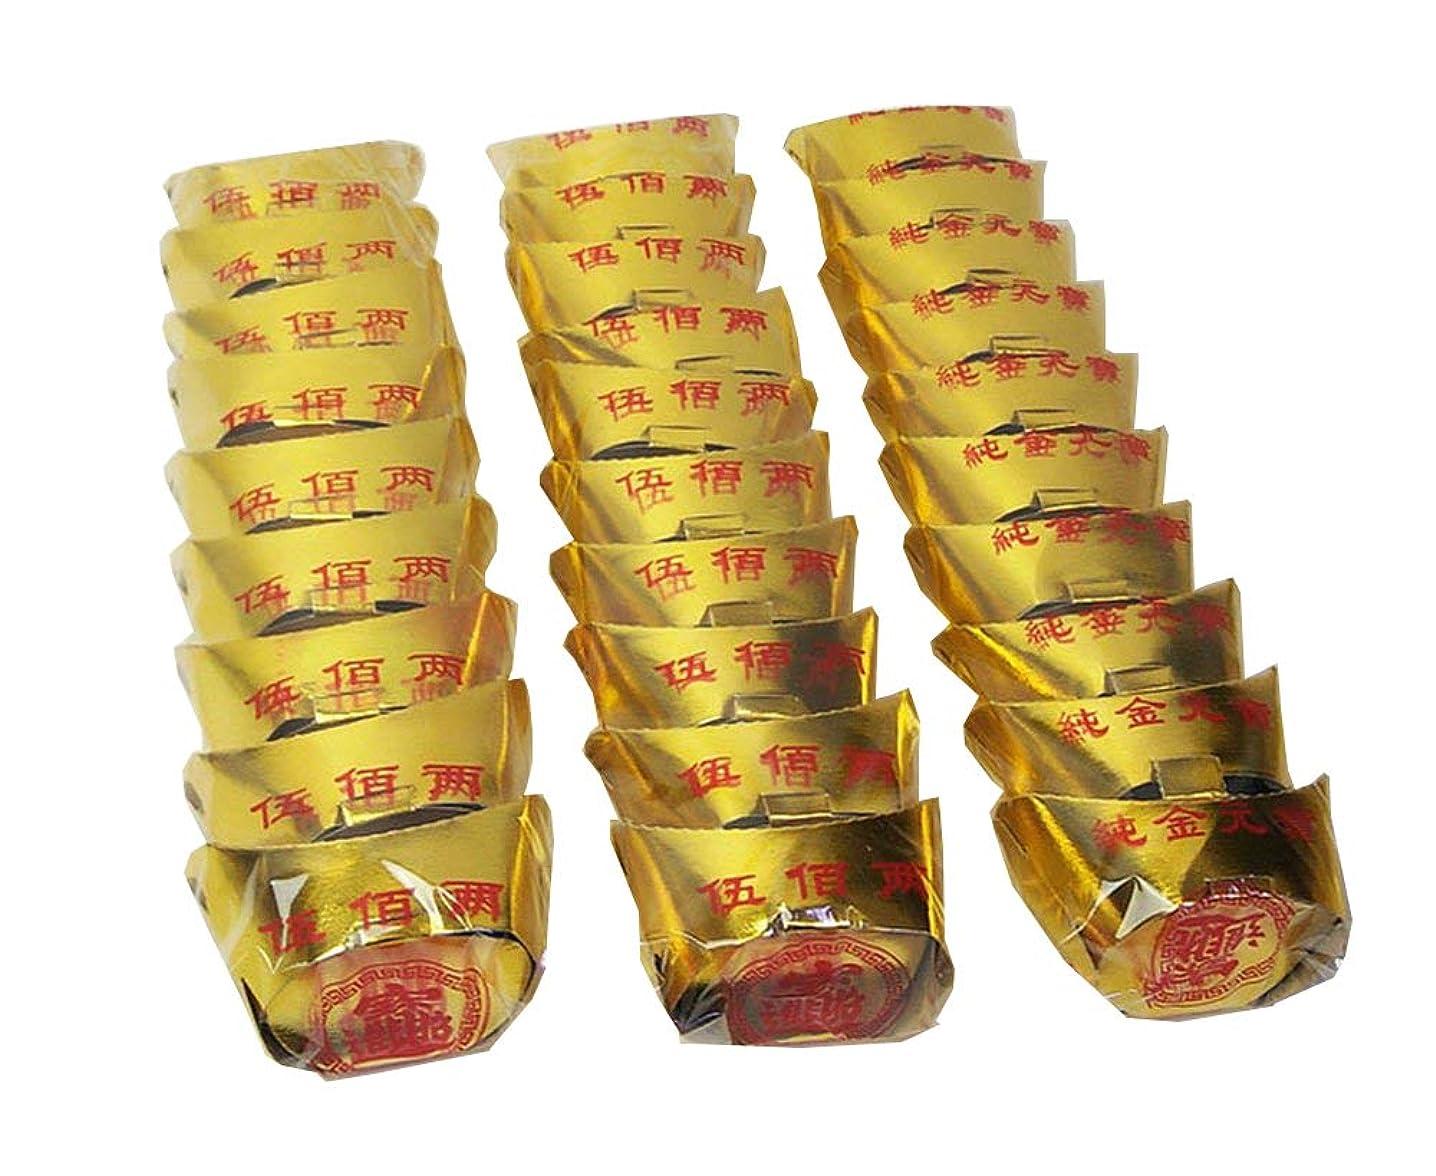 ZeeStar Yellow Golden Ingot/Yuan Bao,Chinese joss Paper Folding Gold Ingot for Ancestral Worship (30 Pack)